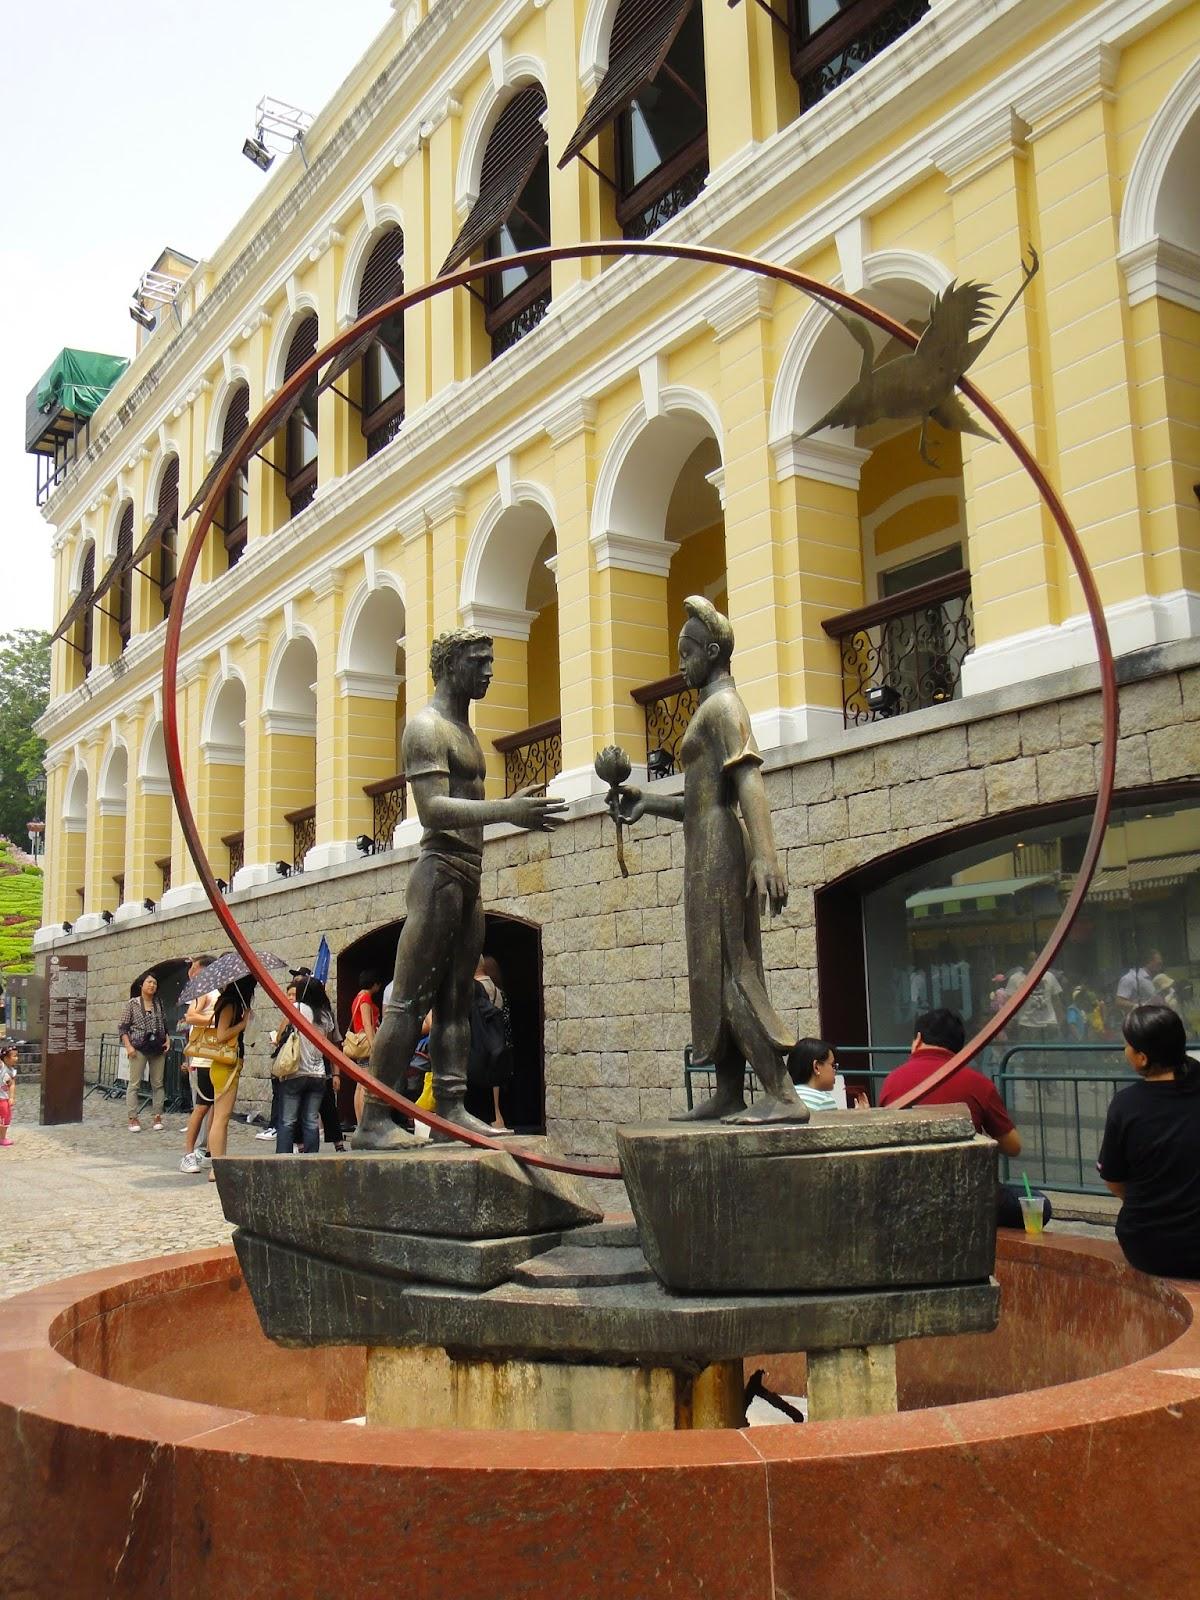 A couple structure at Senado Square Macau